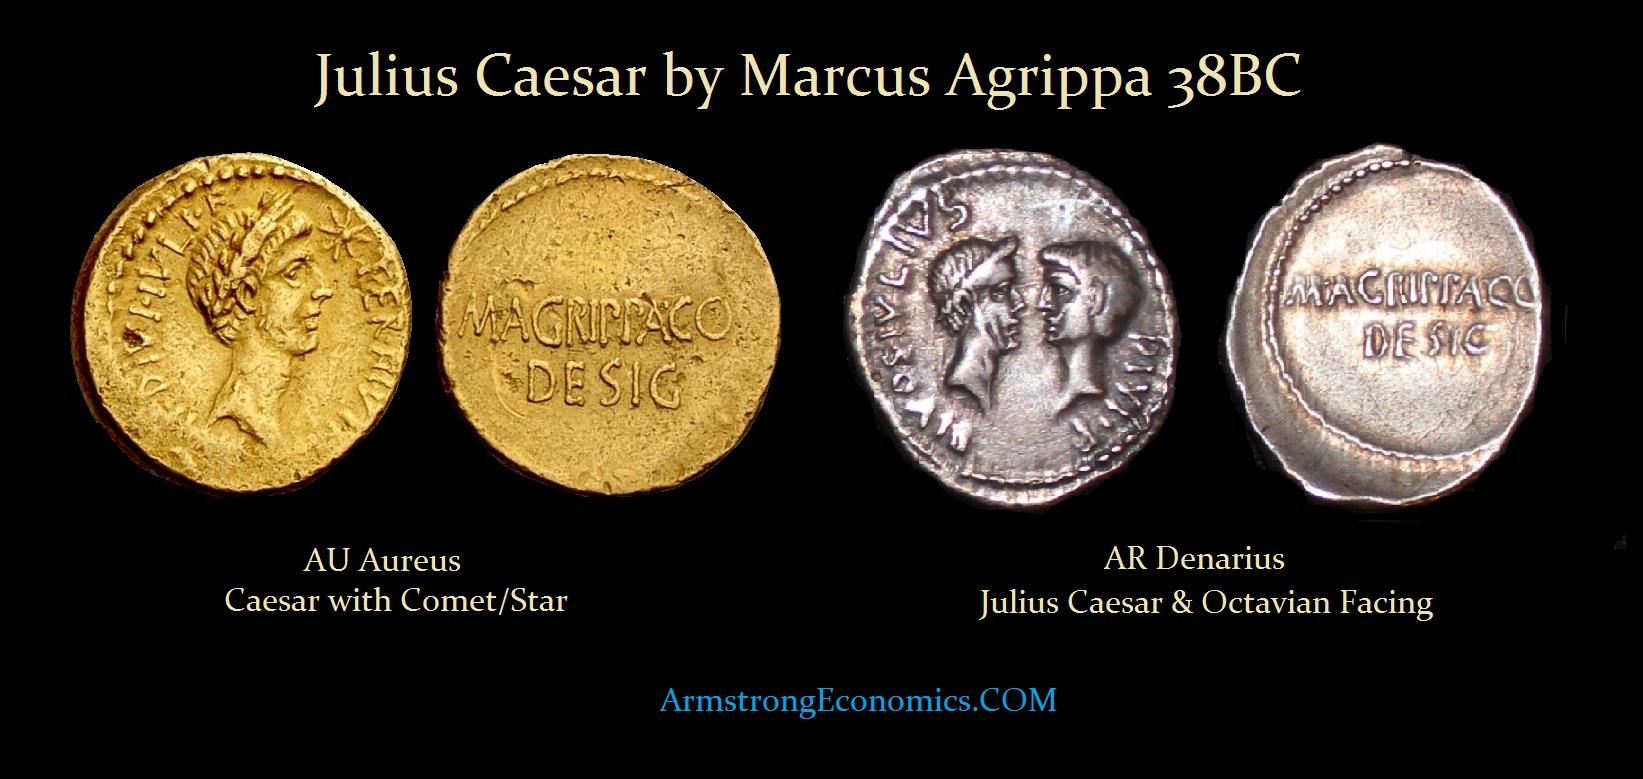 essay on caesar in julius caesar Collection of essays based on the play julius caesar by william shakespeare.